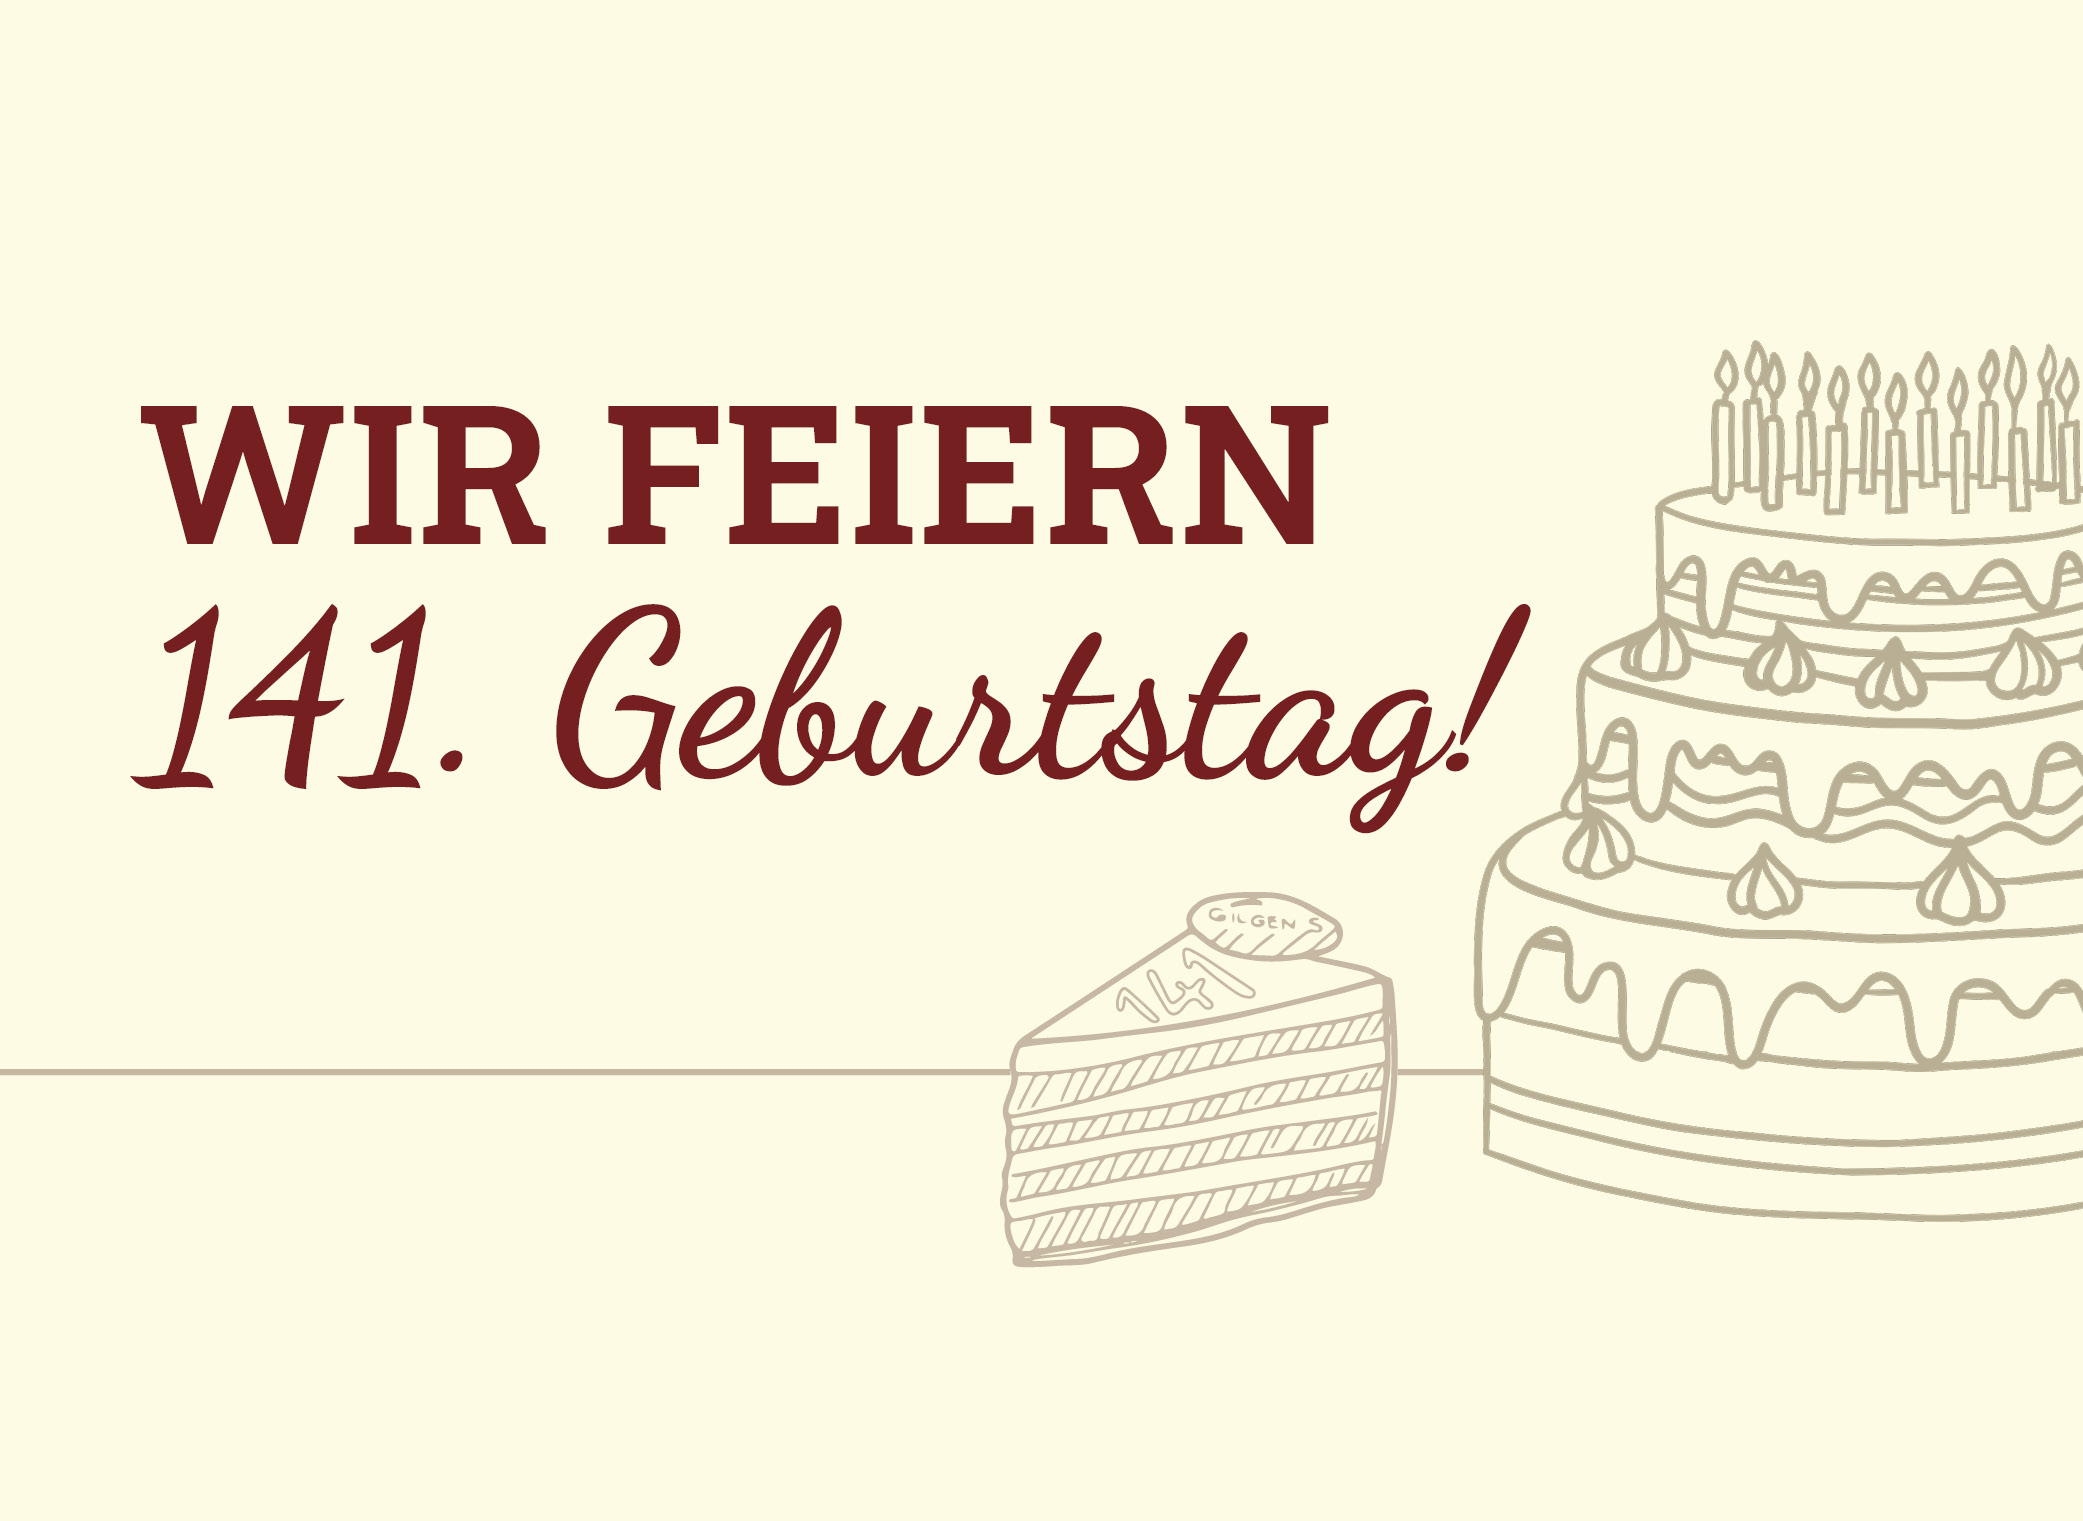 Newsroom-Gilgen-s-Geburtstag1Pq2UYFf91S8Z6